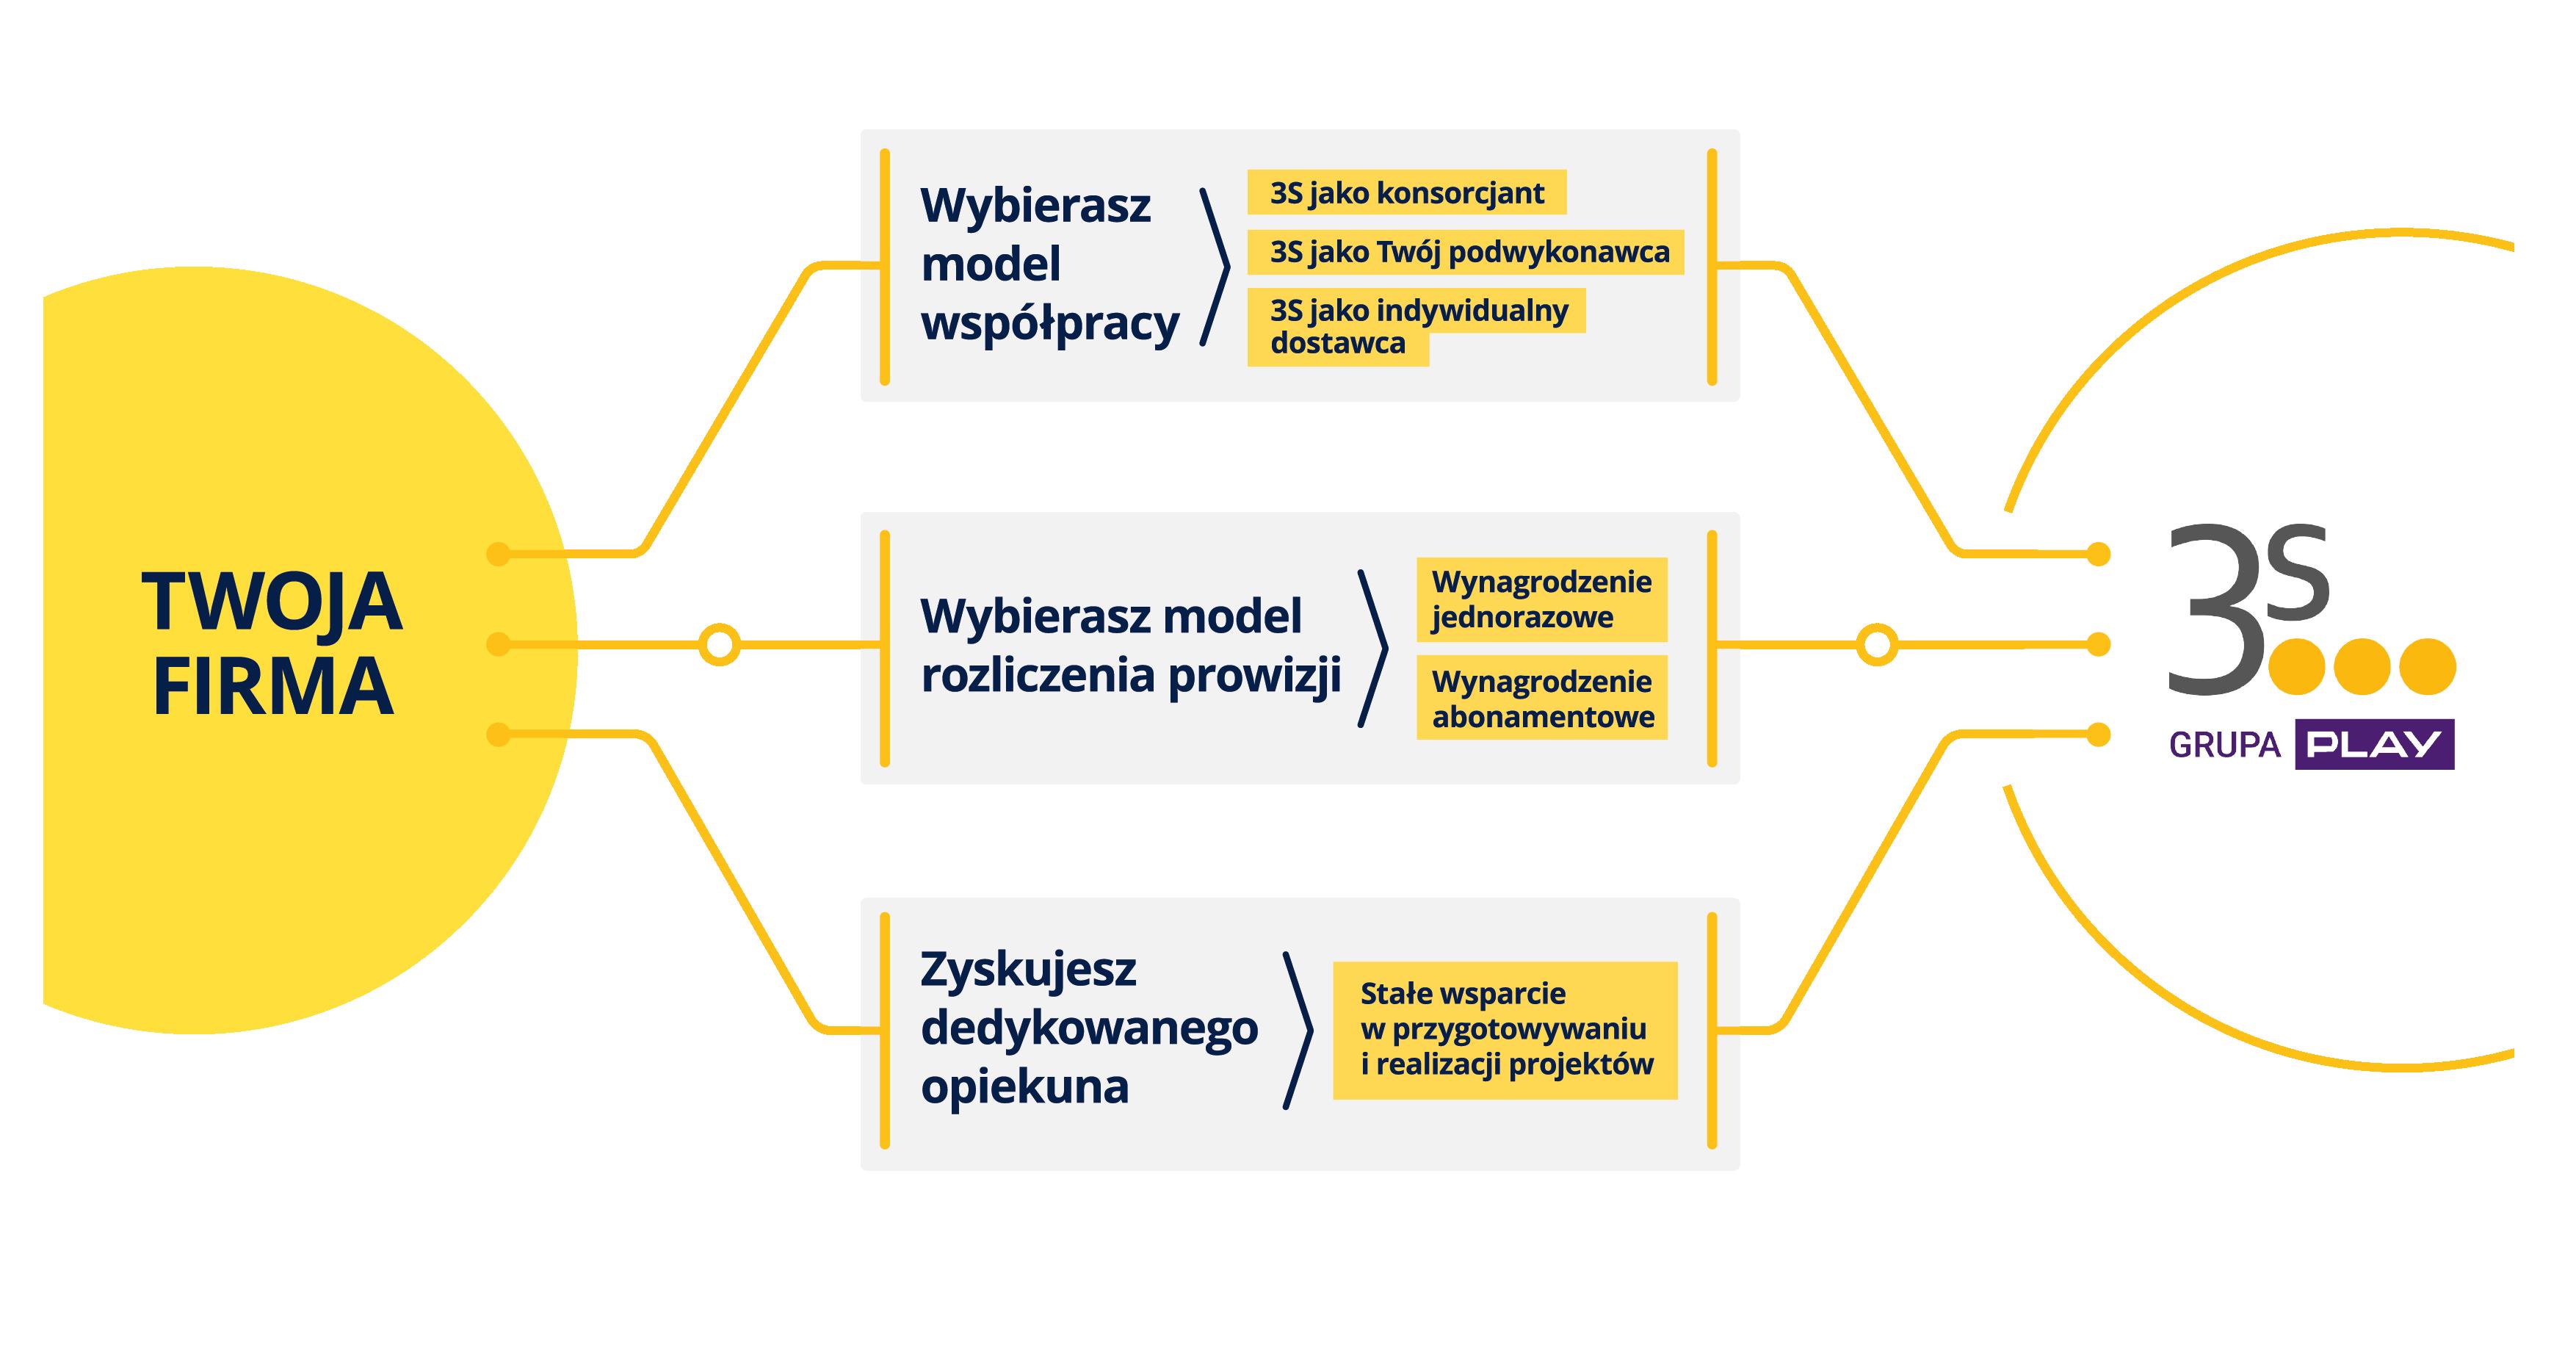 Integratorzy model współpracy